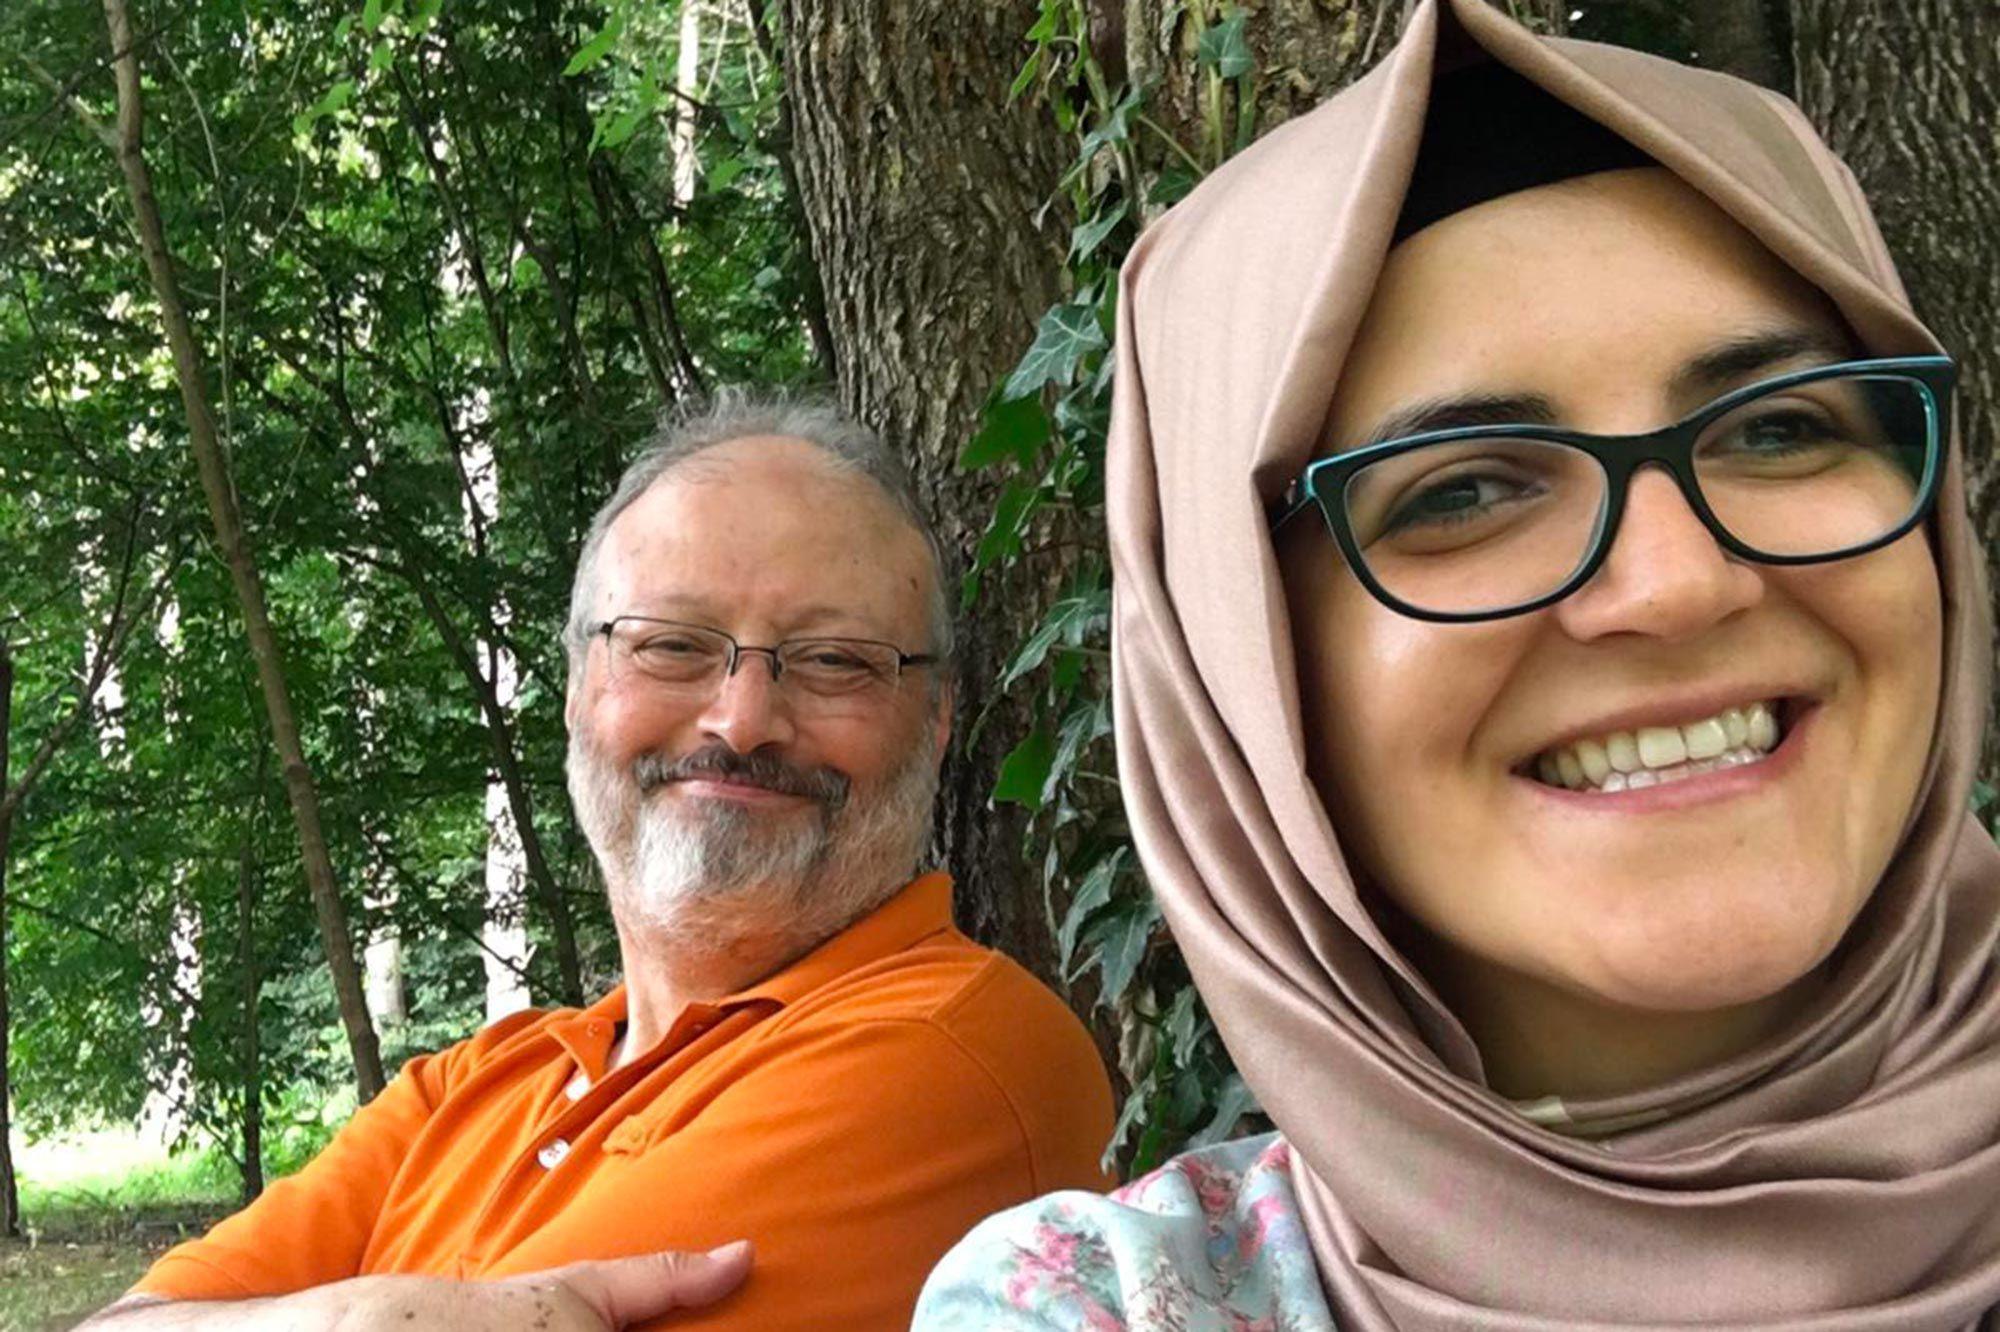 No one has the right to pardon his killers - Jamal Khashoggi's fiance rejects his son's announcement of forgiving his killers lindaikejisblog